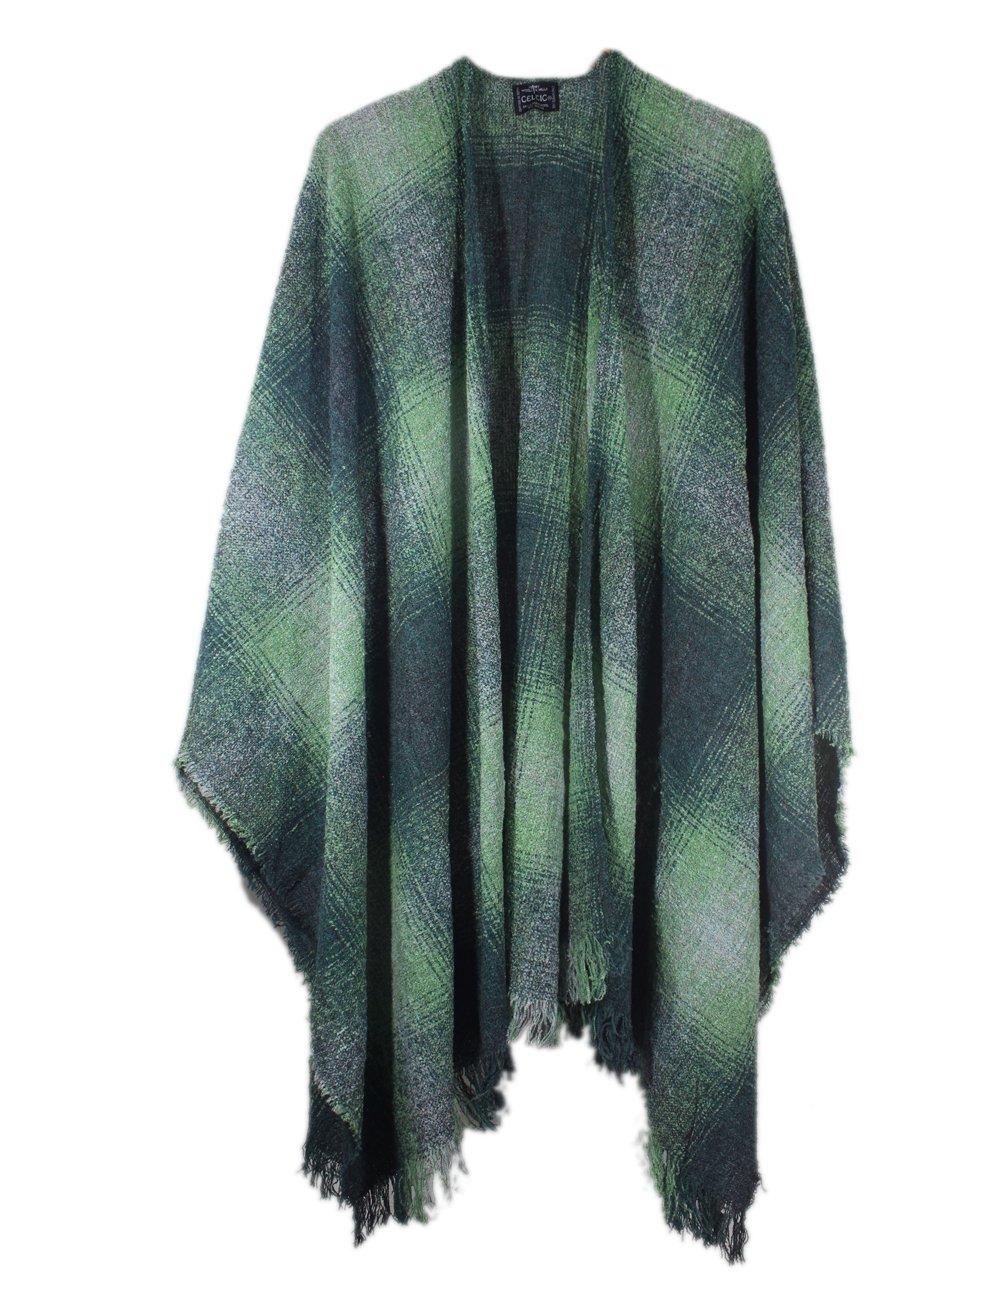 Wool Ruana Green Check Kerry Woollen Mills Made in Ireland